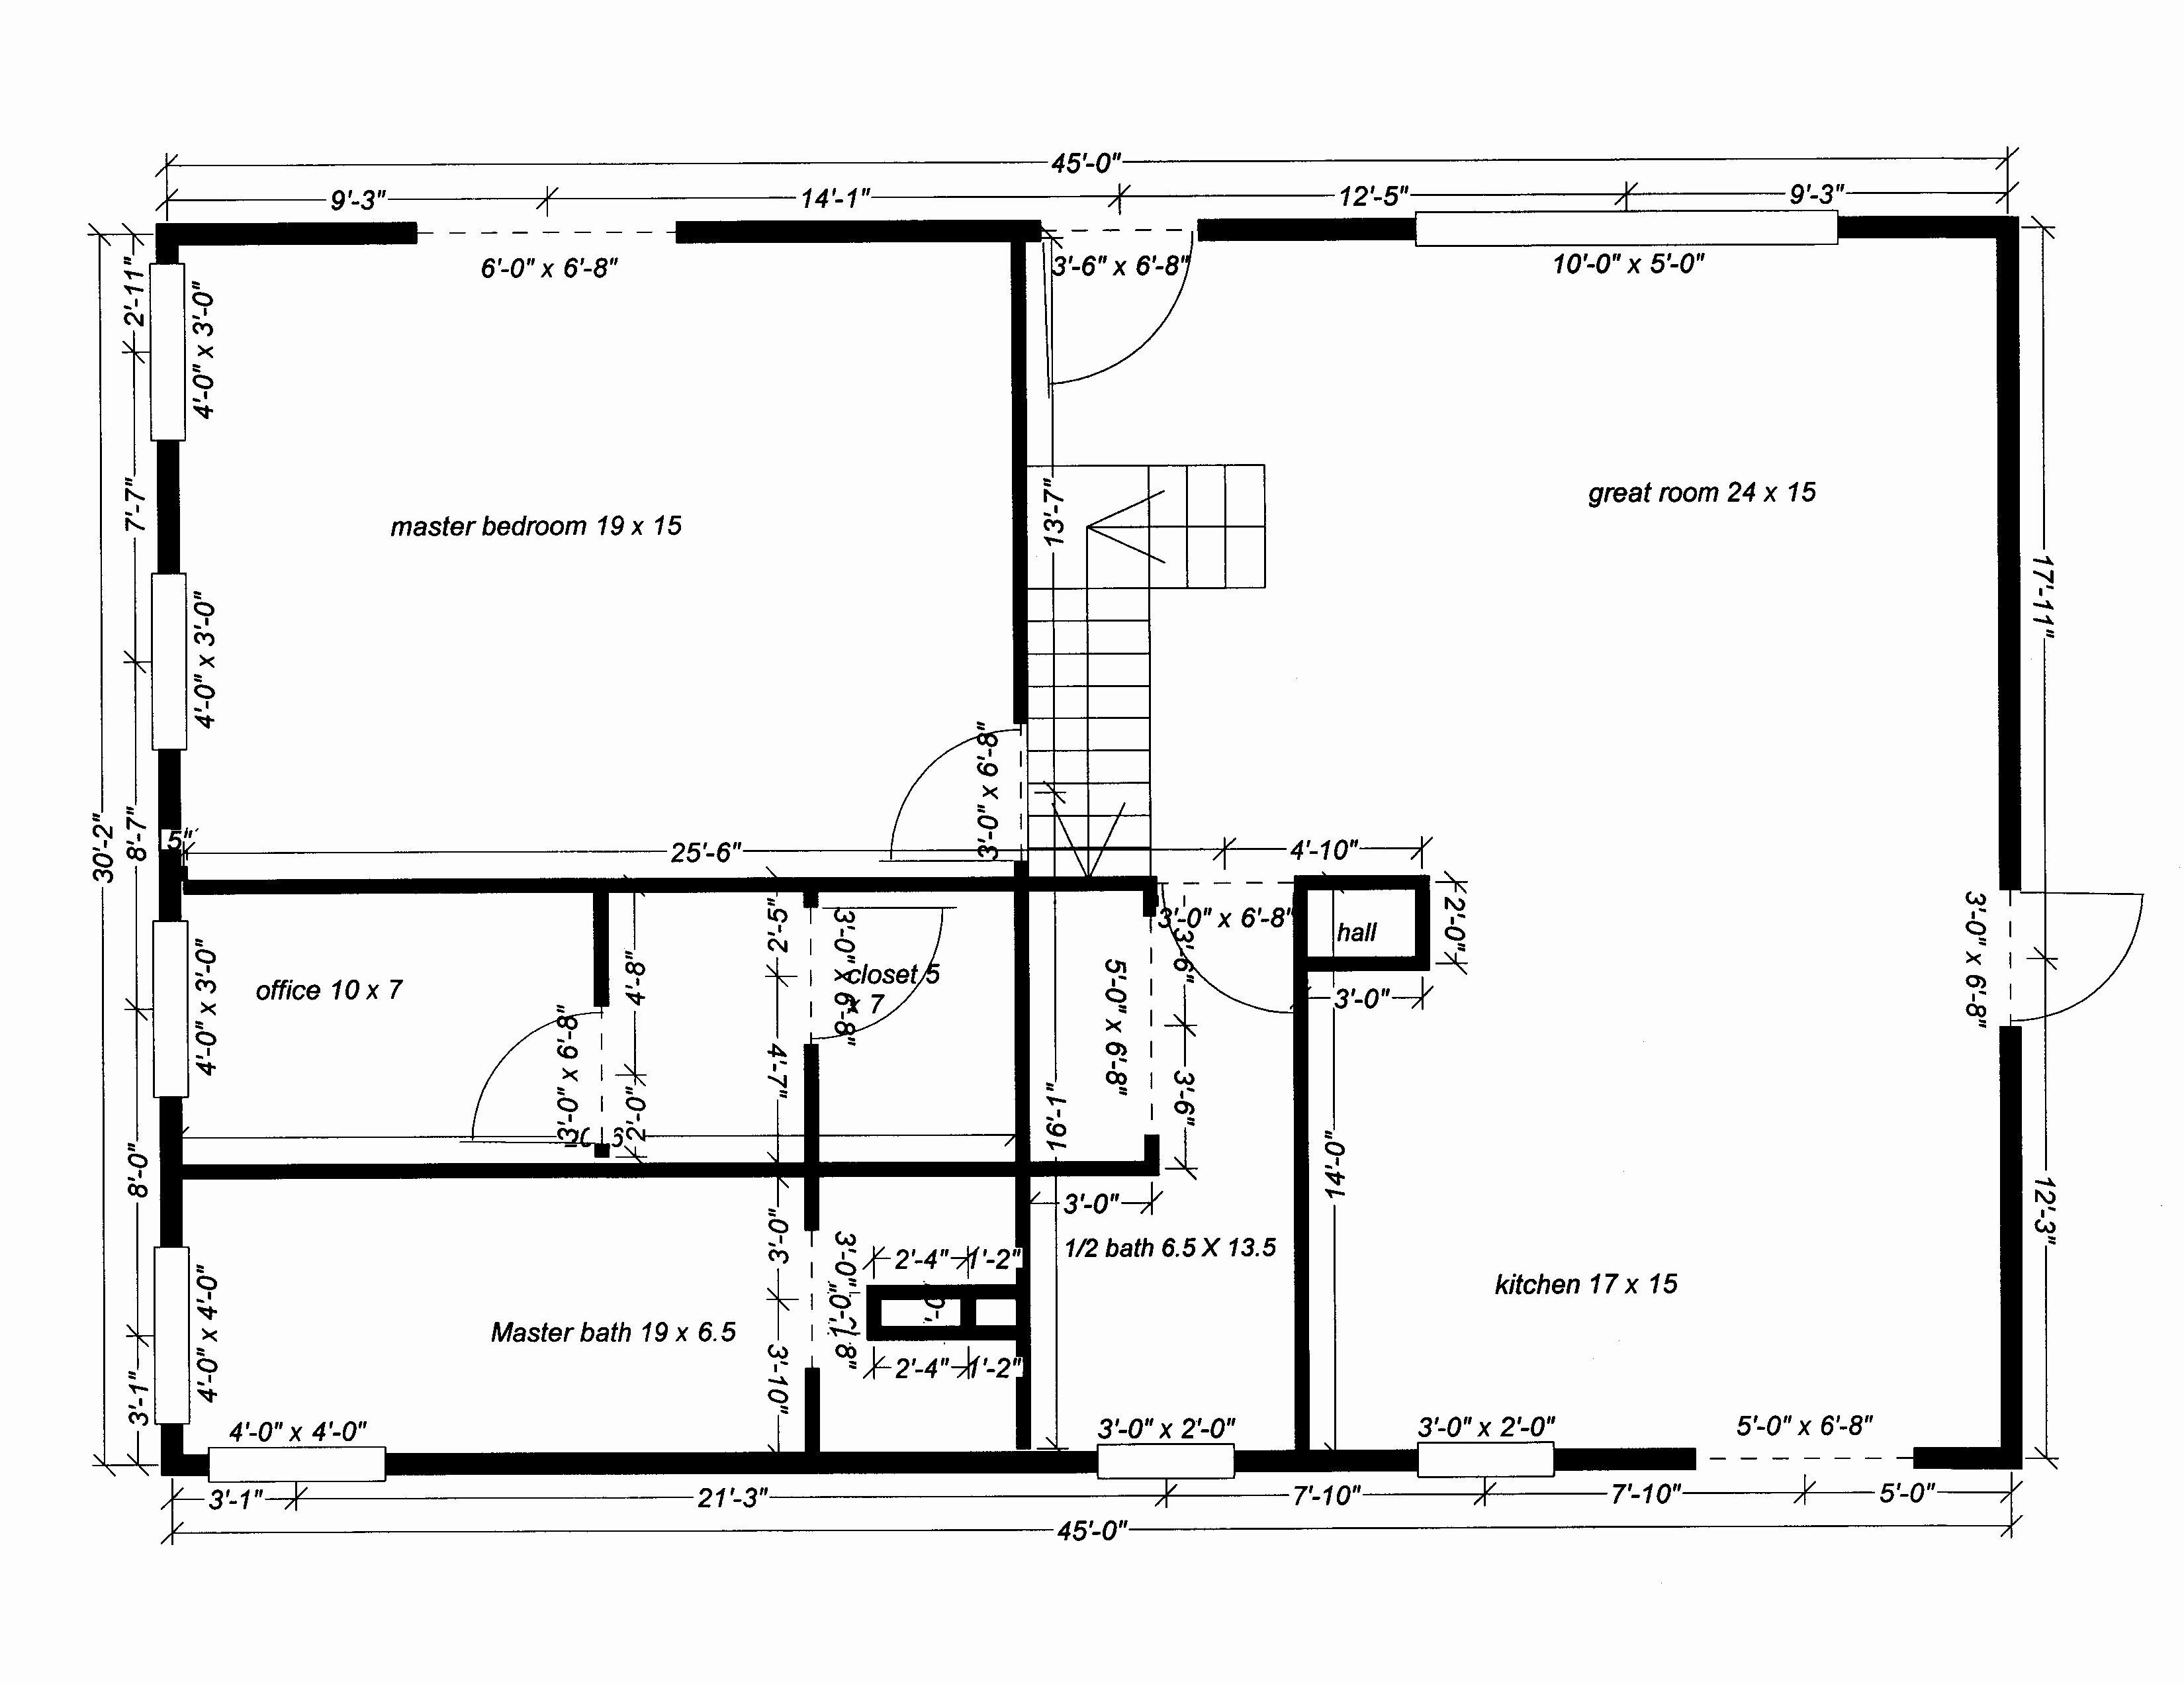 Blank Floor Plan Templates New Blank House Floor Plan